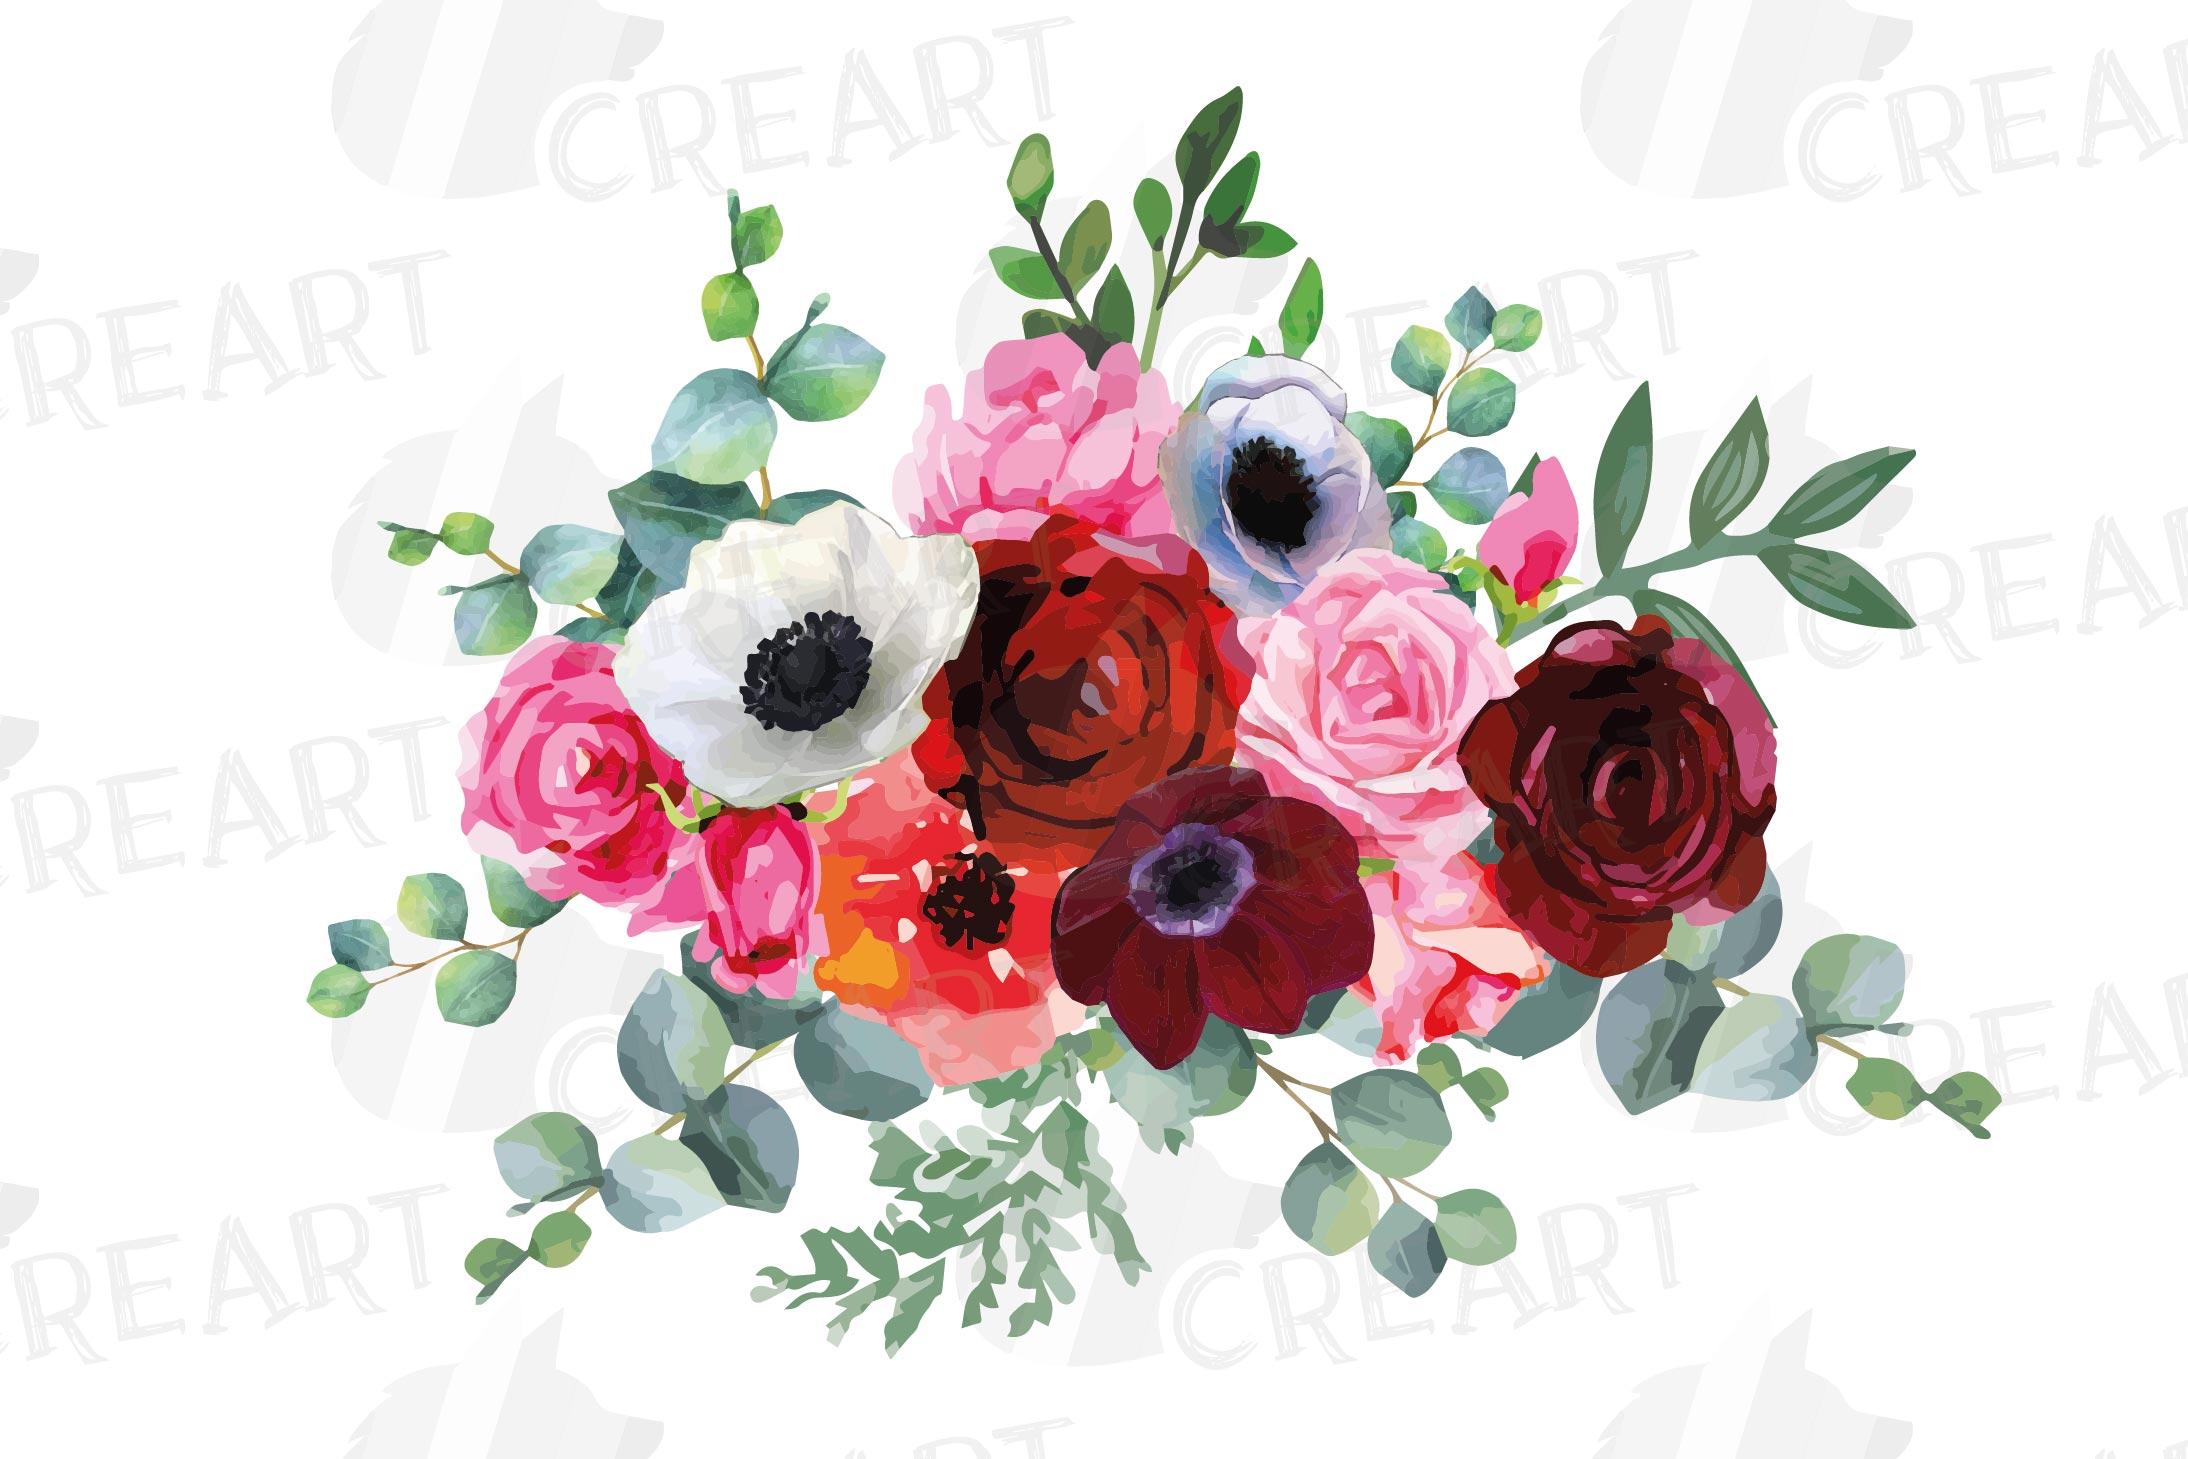 Watercolor elegant floral bouquets, rose, anemone decoration example image 12